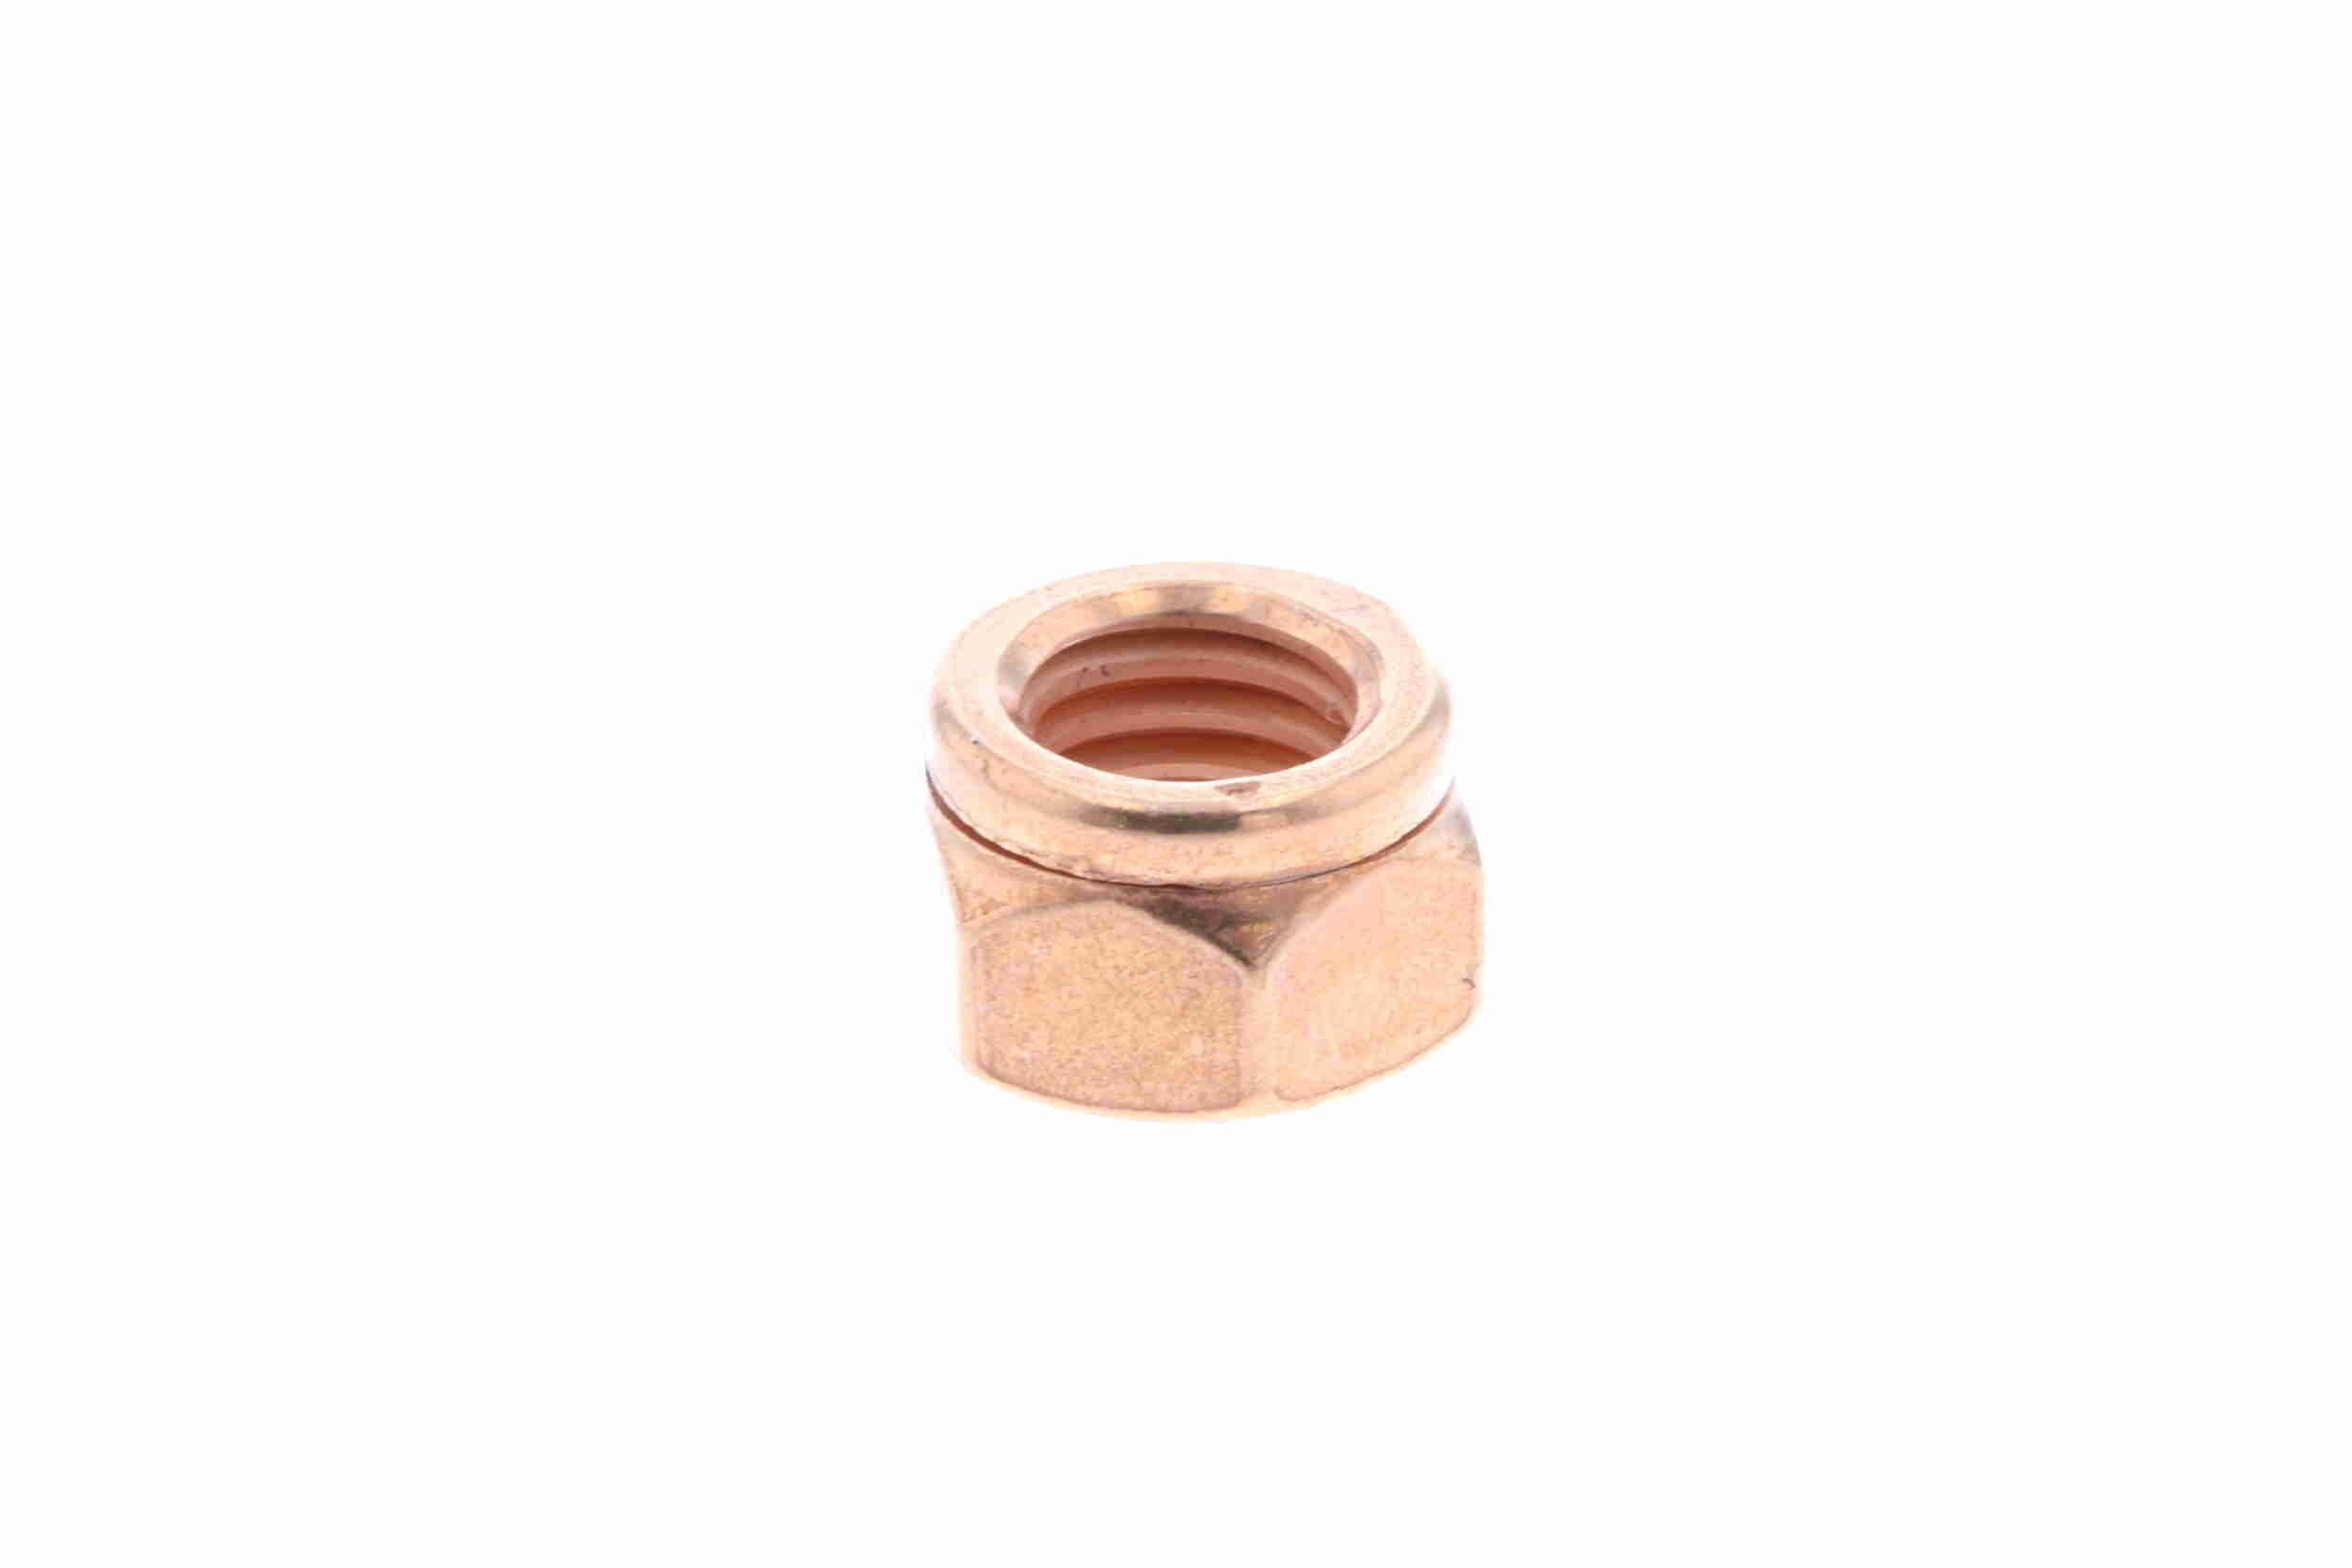 Volkswagen NEW BEETLE 2001 Exhaust system VAICO V20-0835: Original VAICO Quality